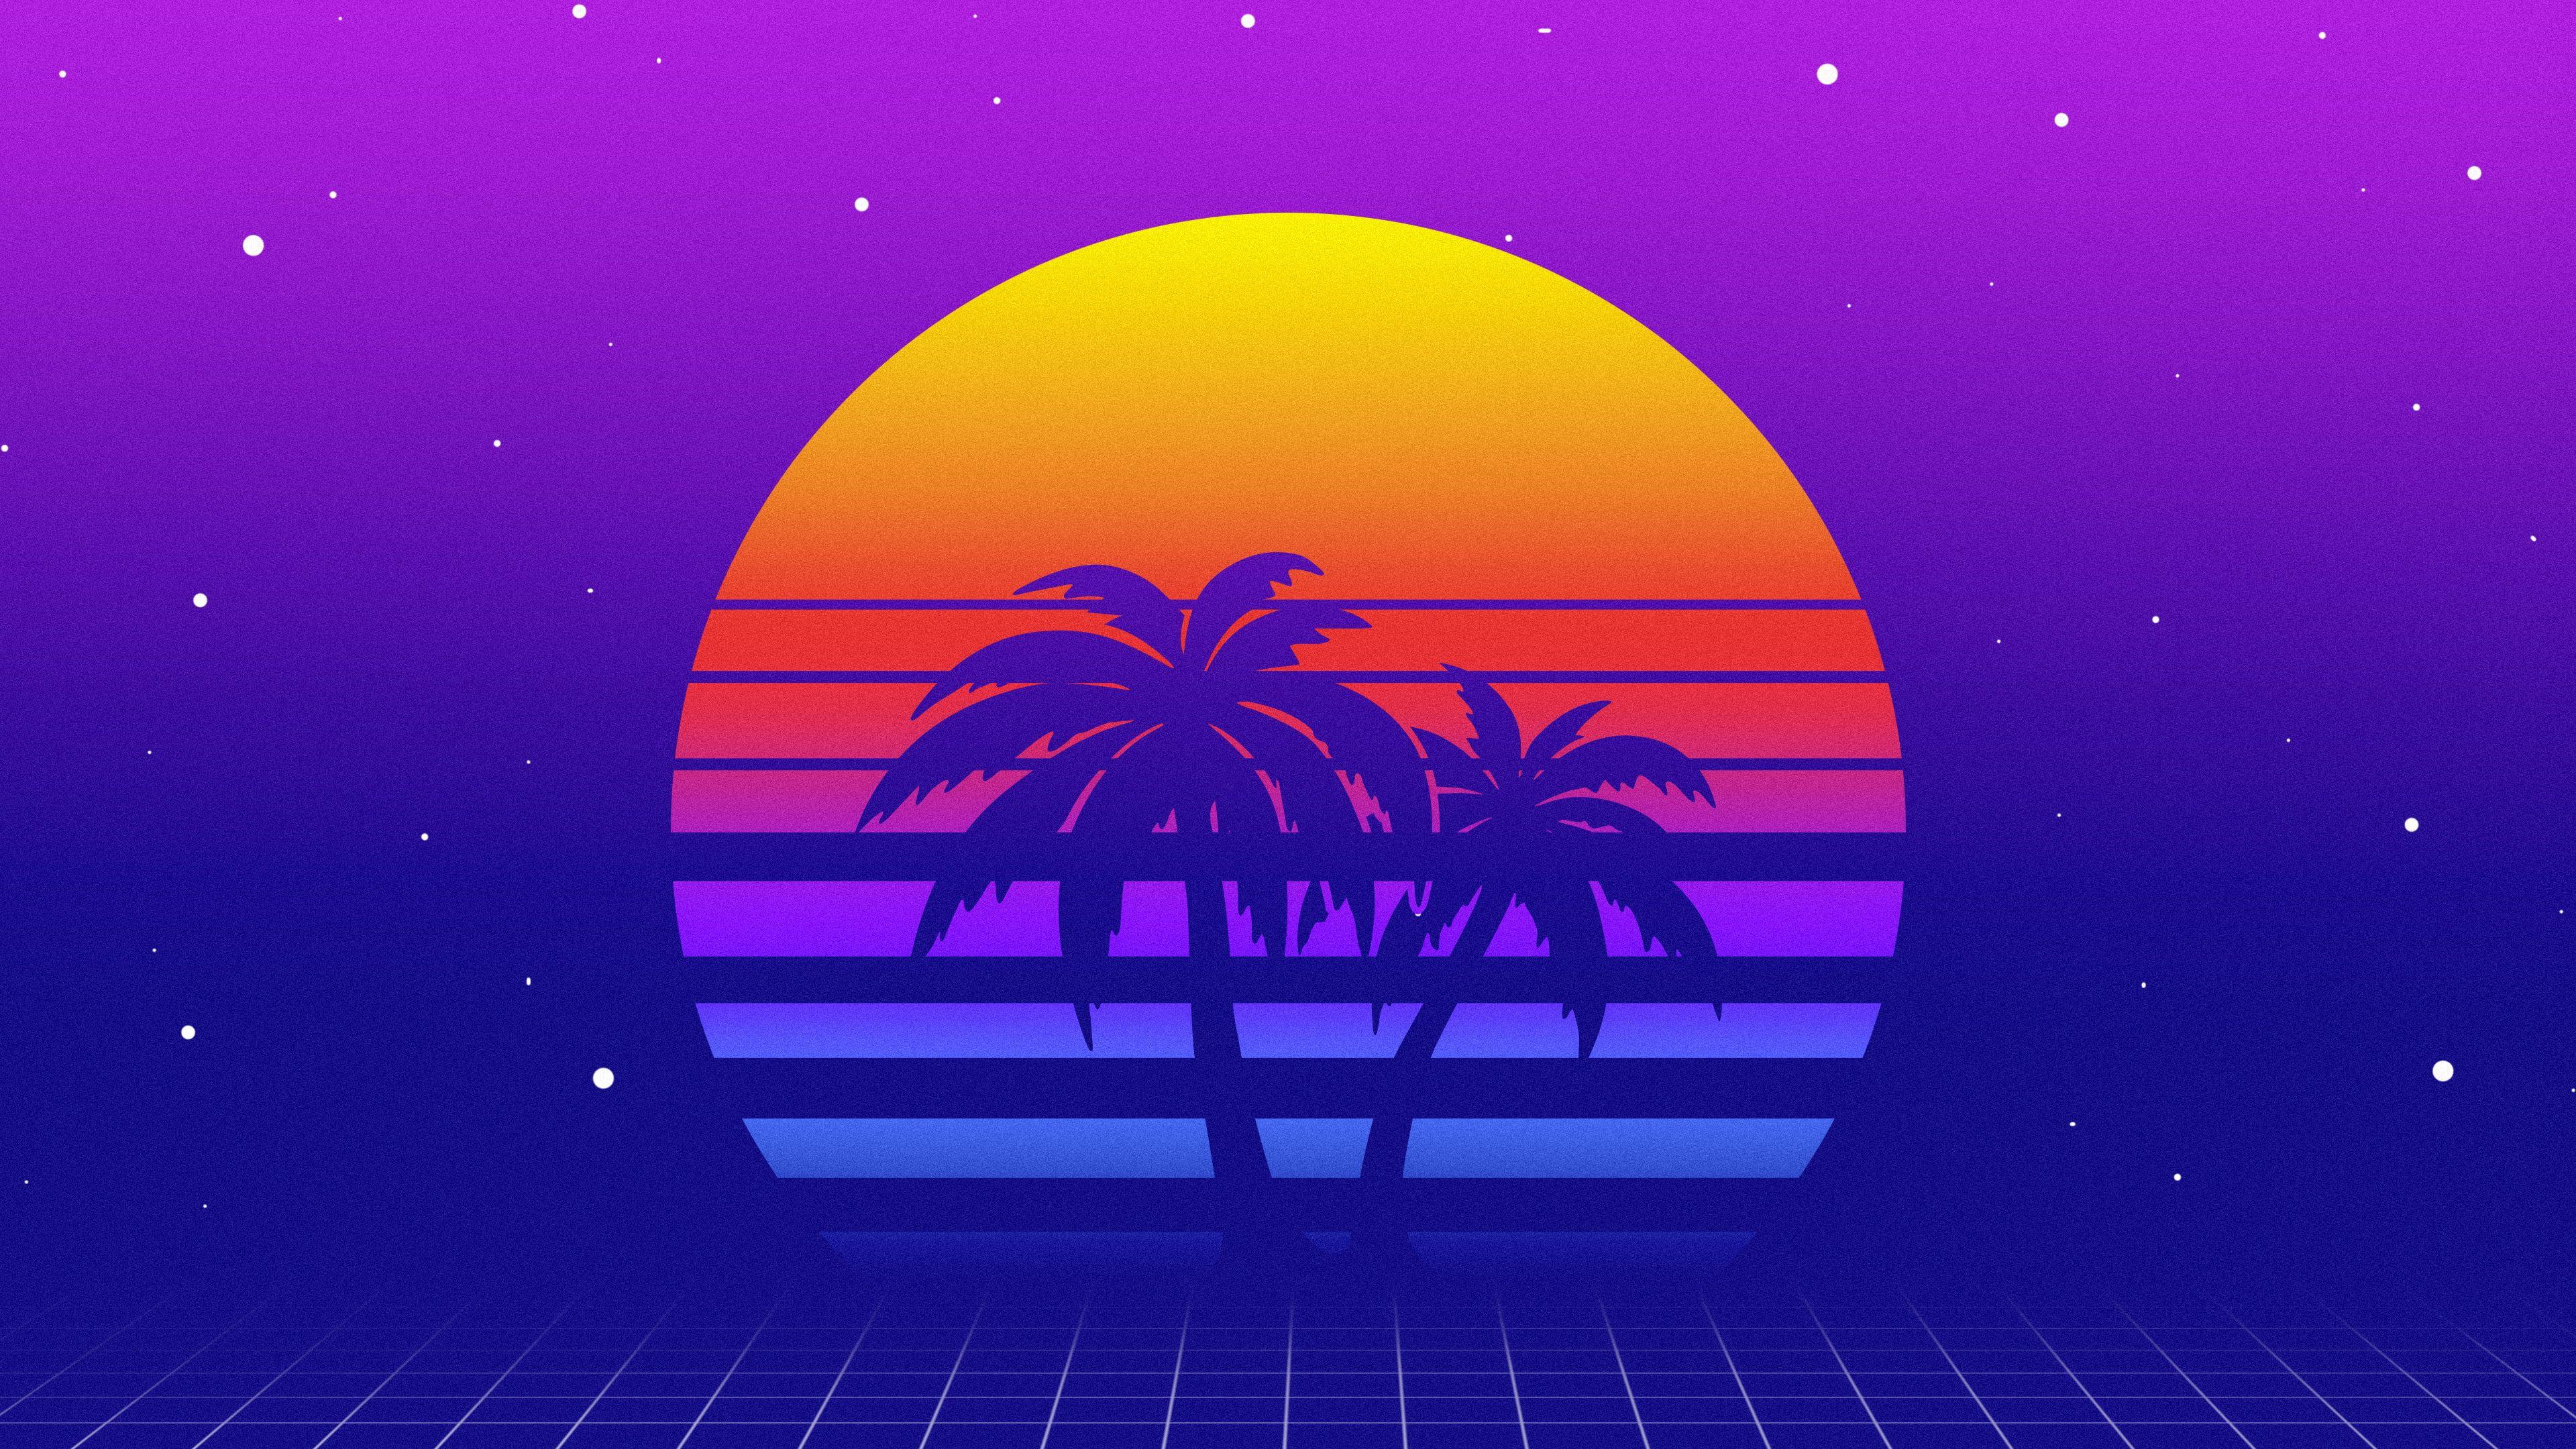 Sunset Retrowave Digital Art Synthwave 4k Wallpaper Hdwallpaper Desktop Synthwave Digital Art Art